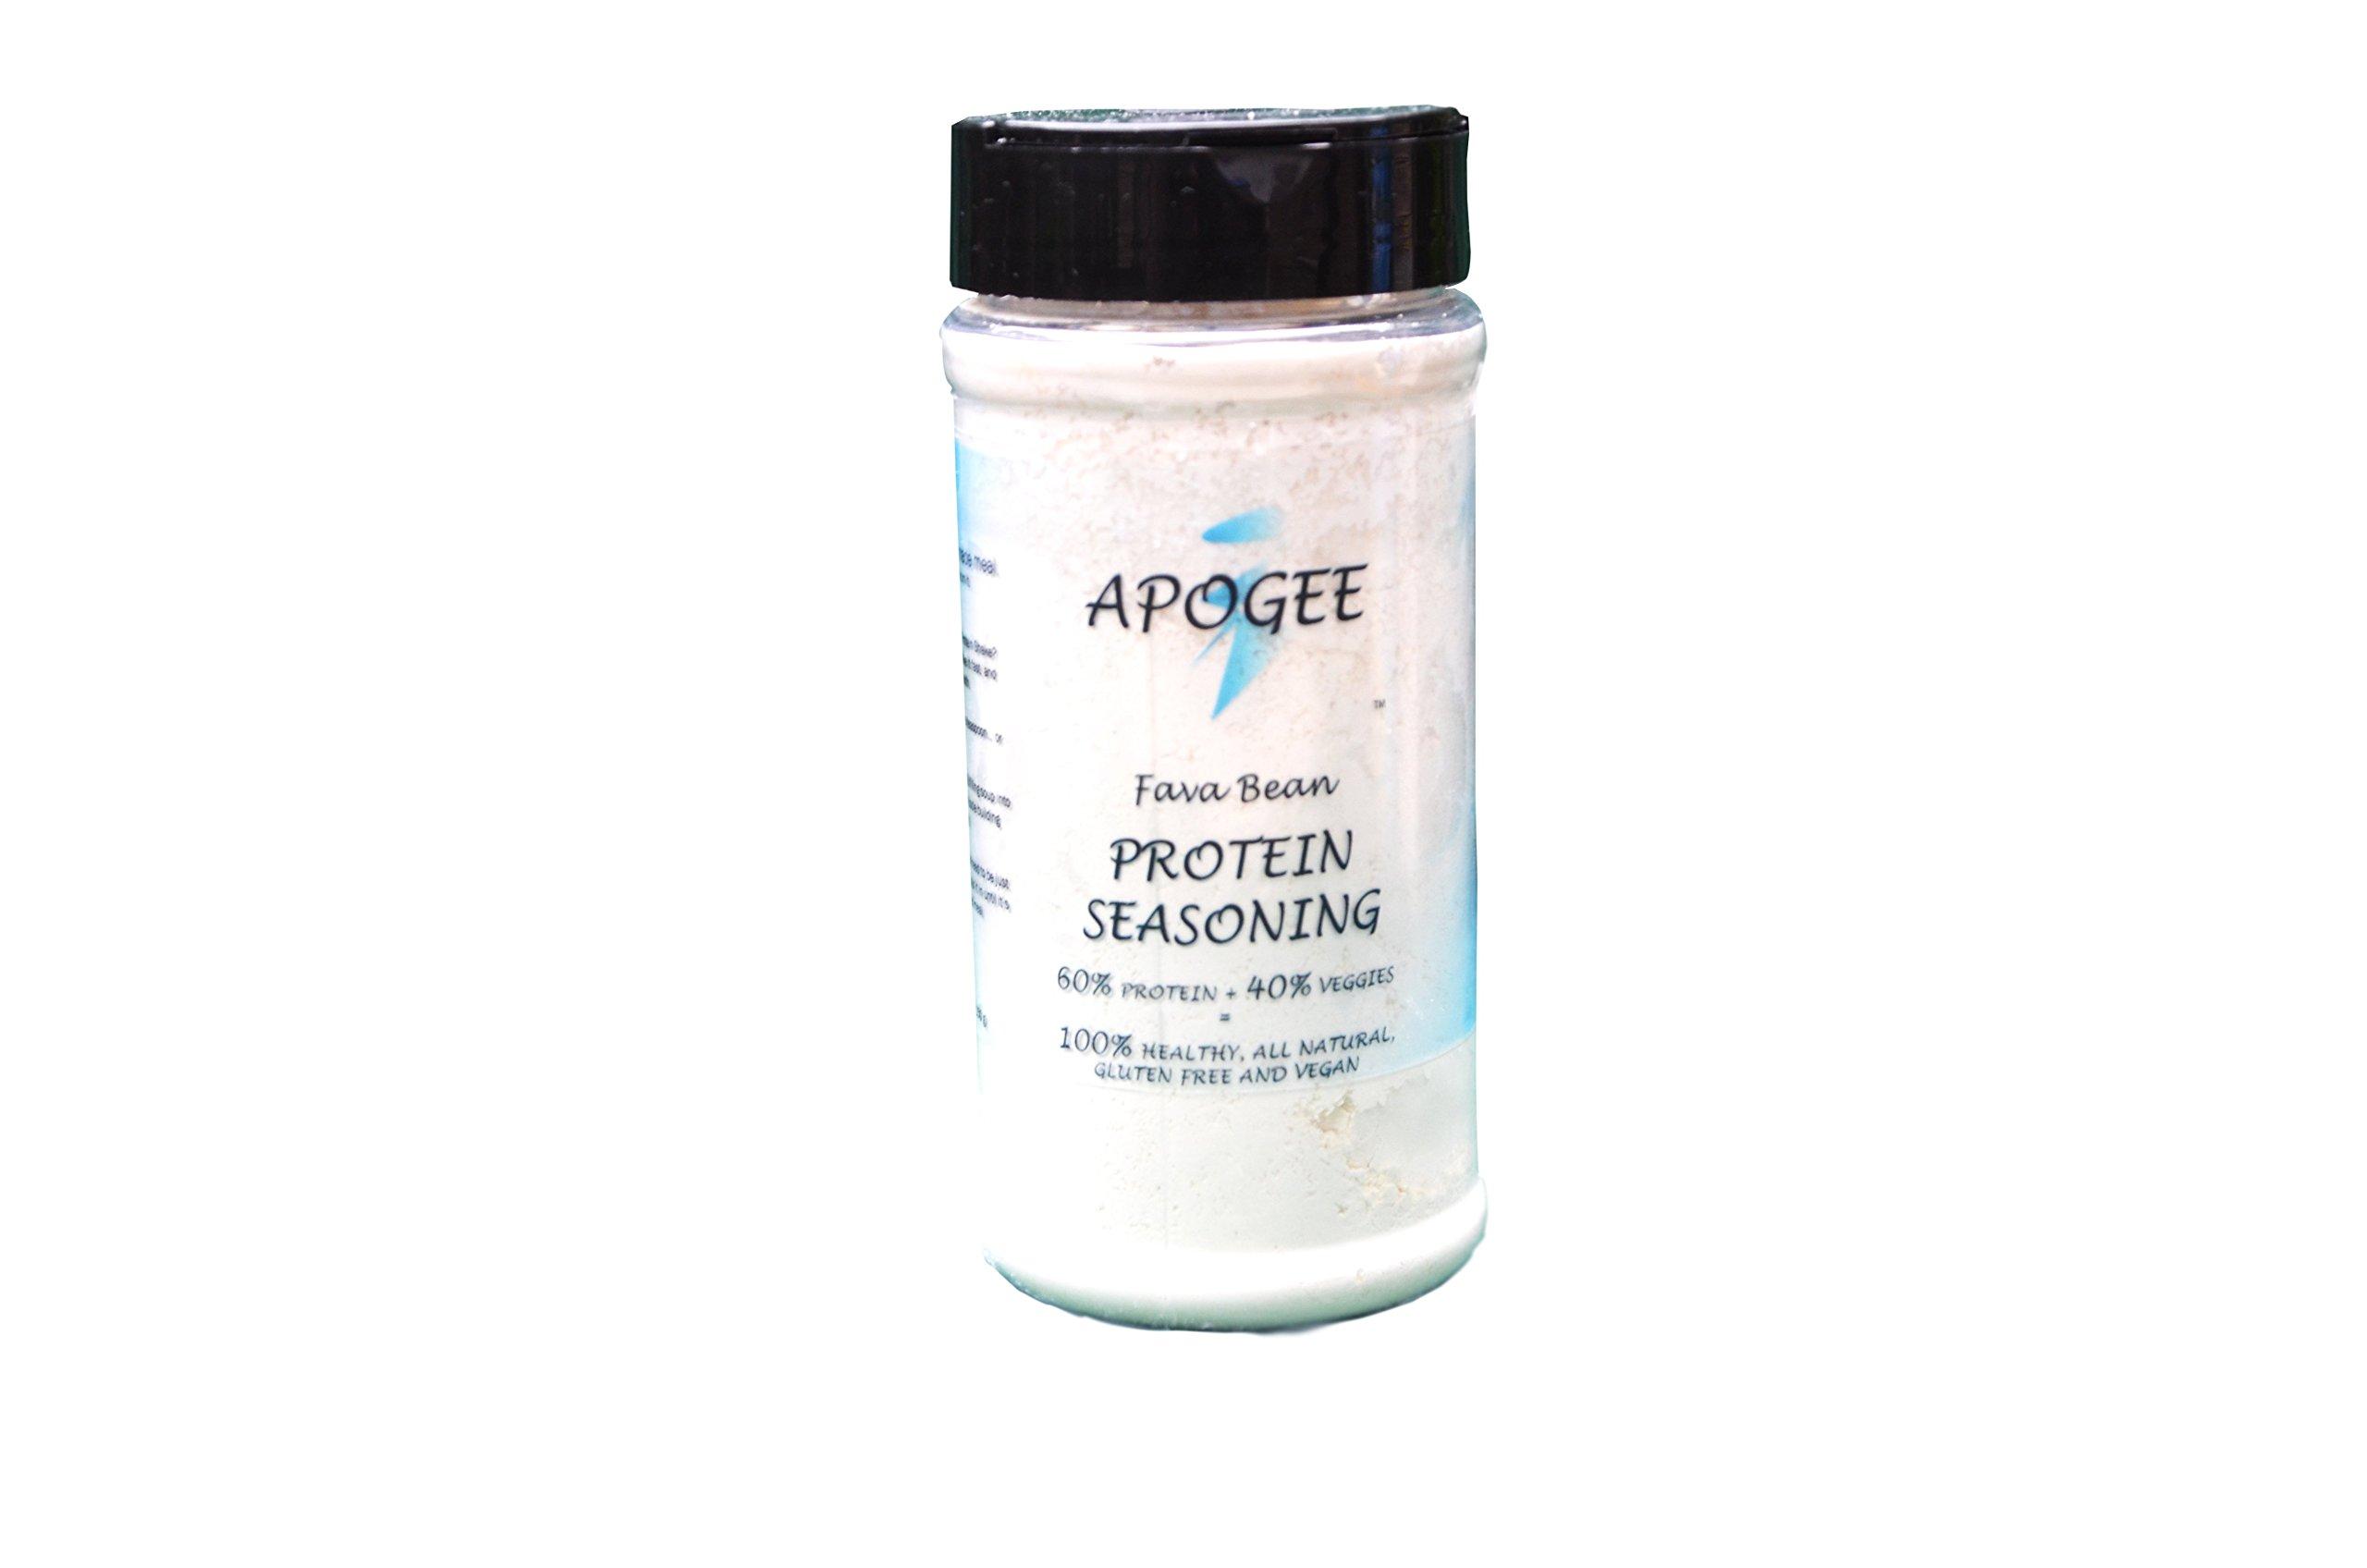 Apogee Fava Bean Protein Seasoning